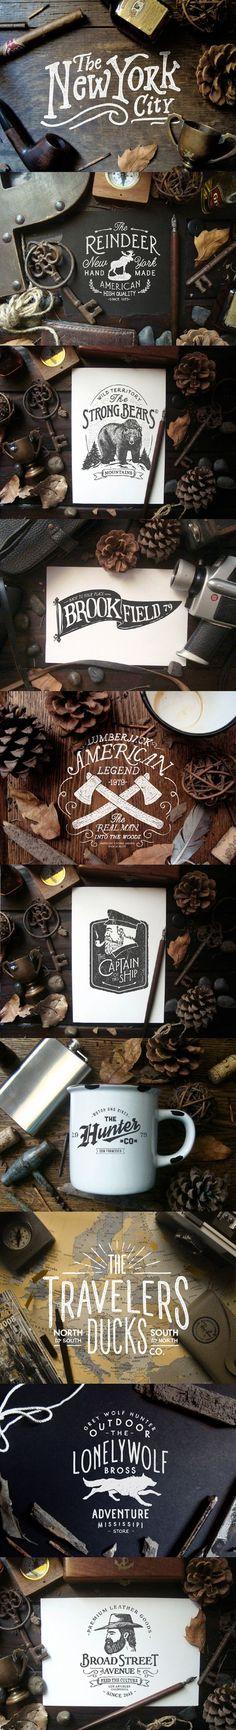 American Rustic by OPUSNIGRUM .: